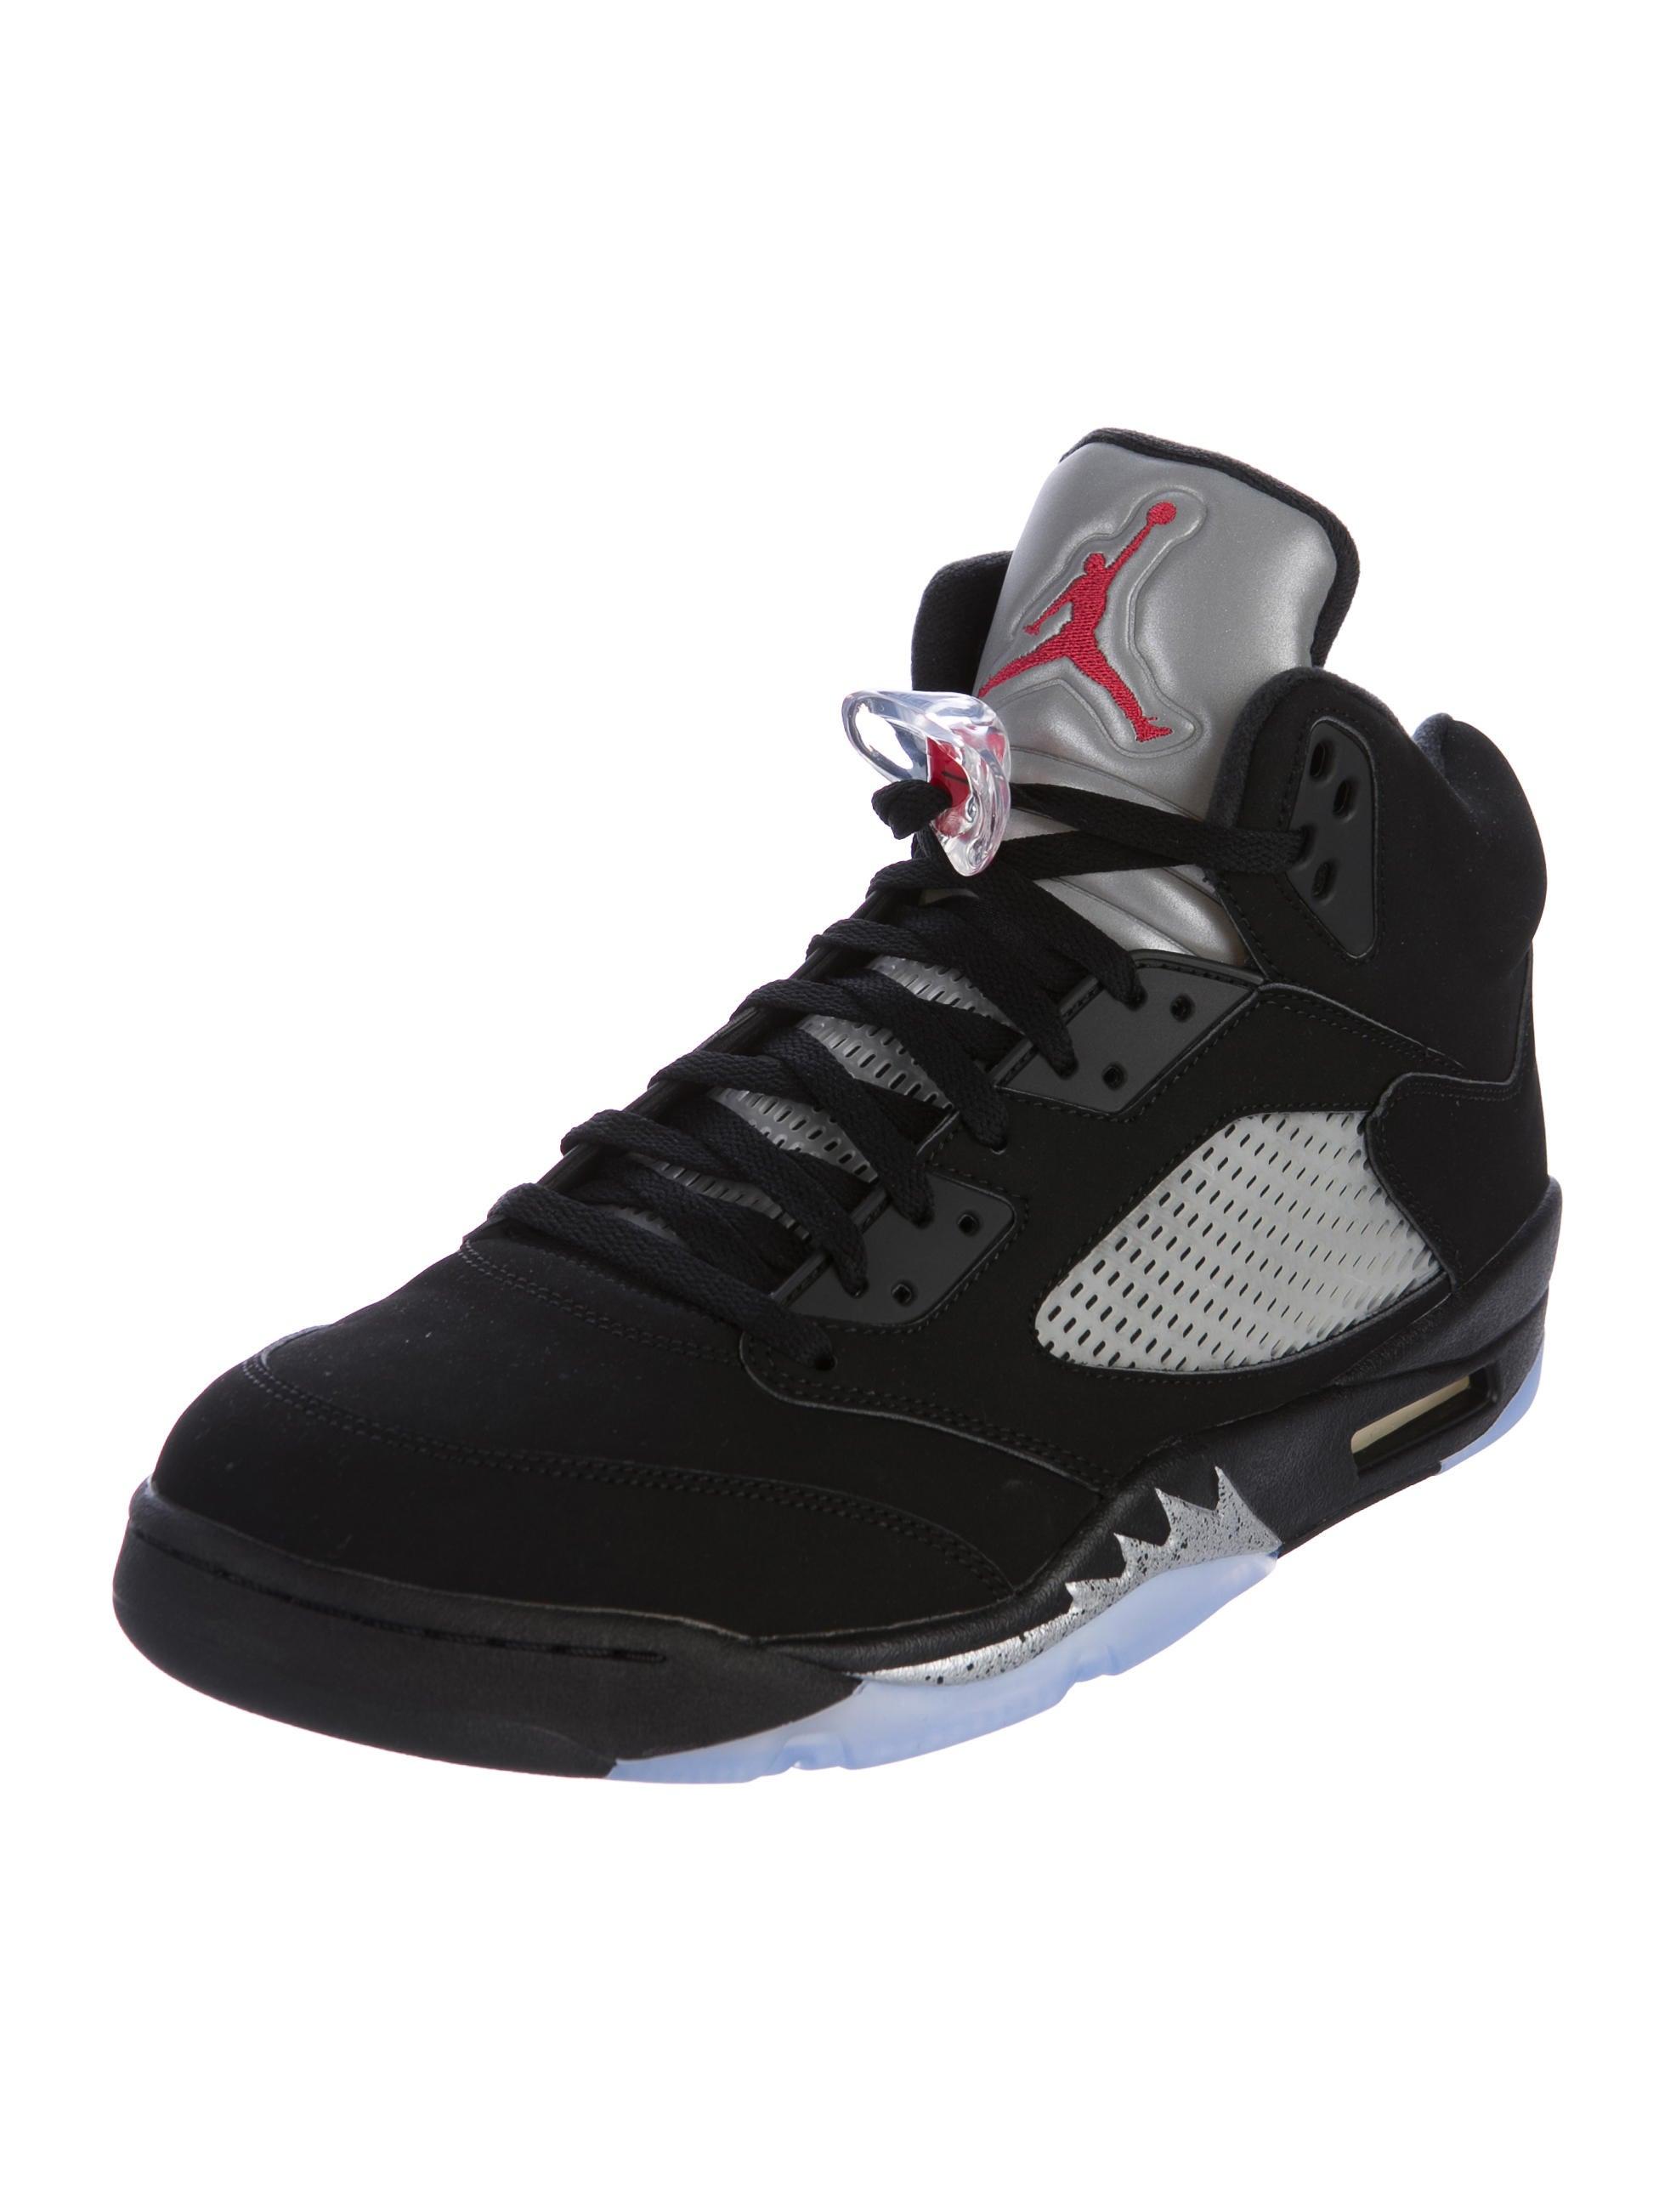 nike air jordan 5 retro metallic sneakers shoes wniaj20415 the realreal. Black Bedroom Furniture Sets. Home Design Ideas